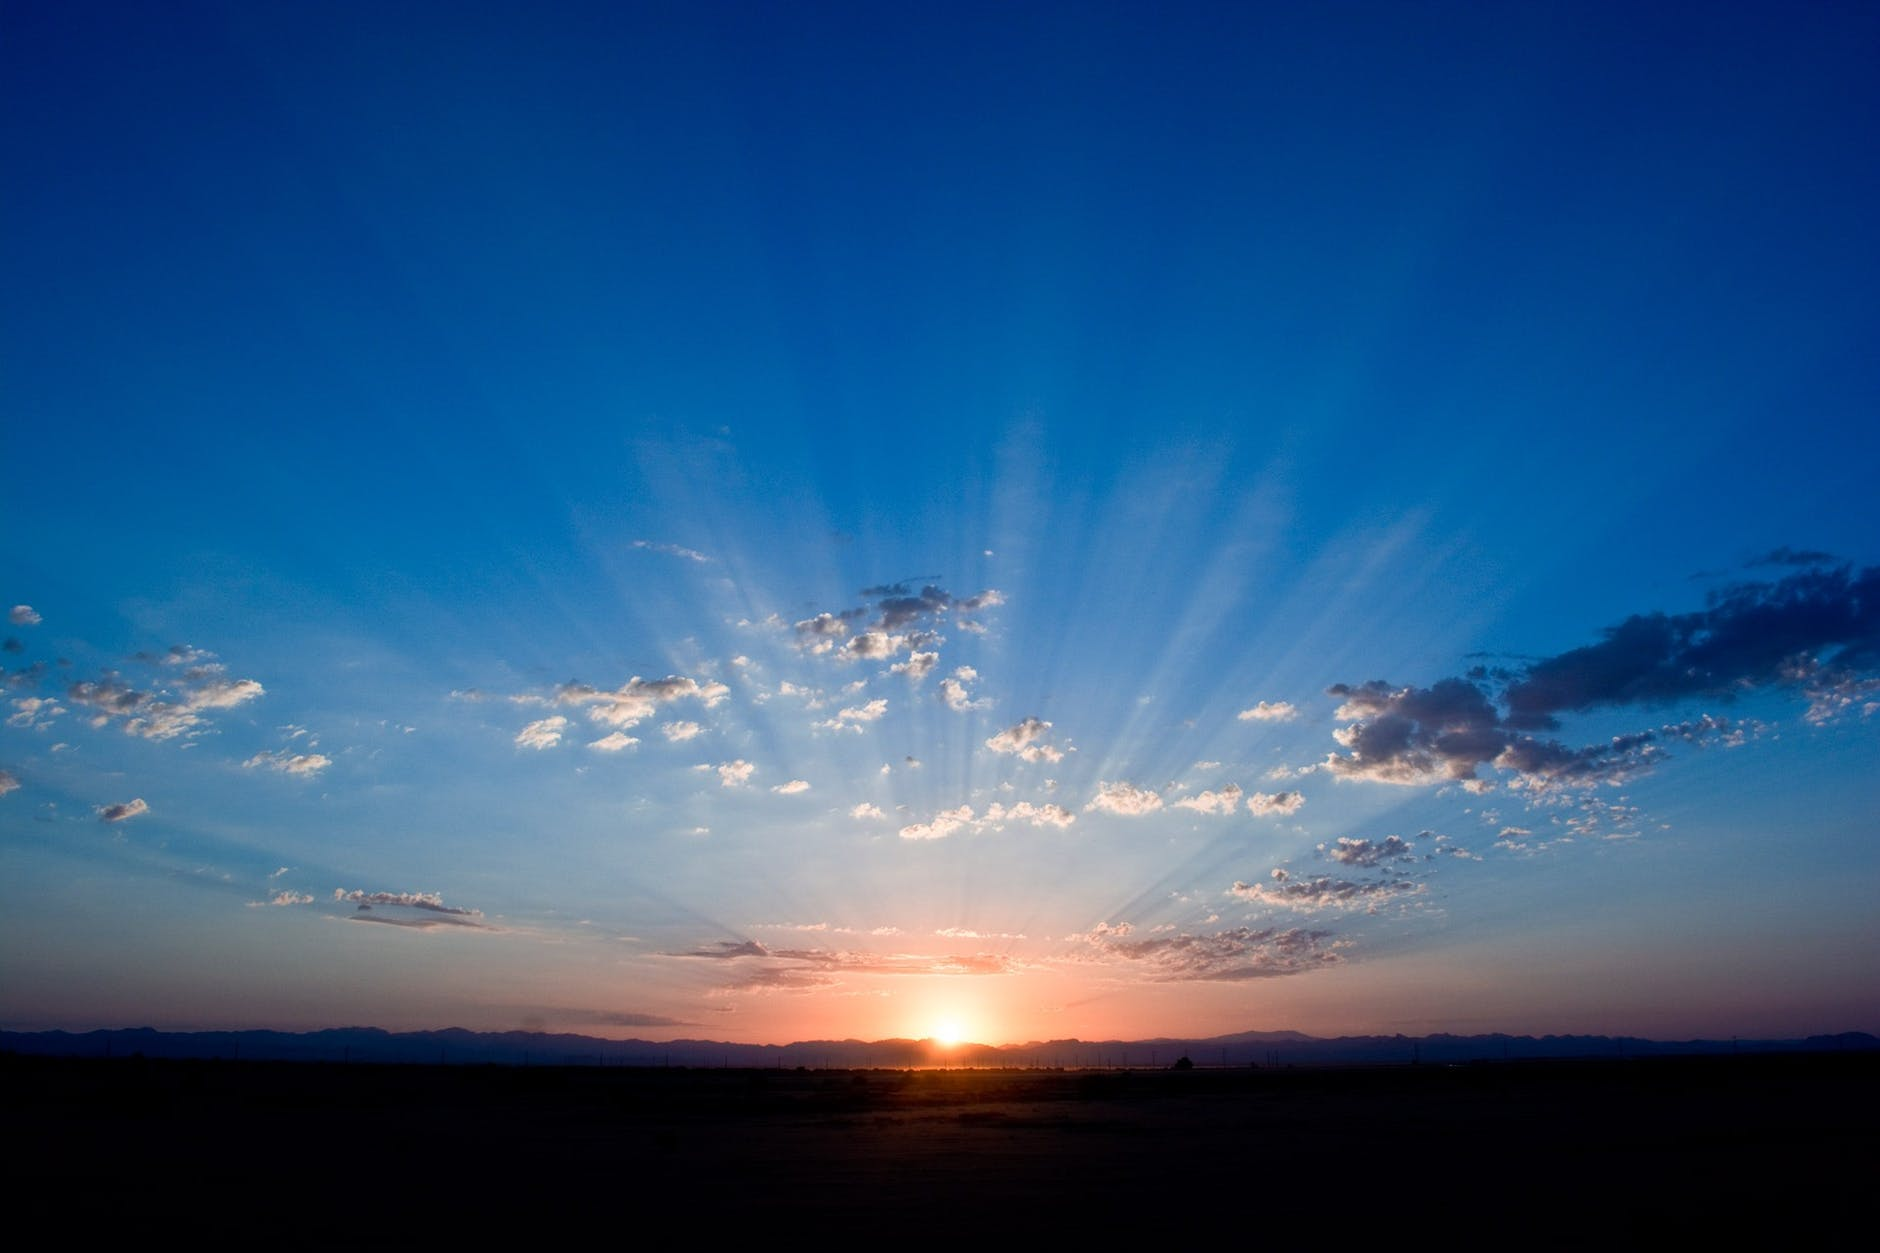 sunrise-sky-blue-sunlight-67832.jpeg